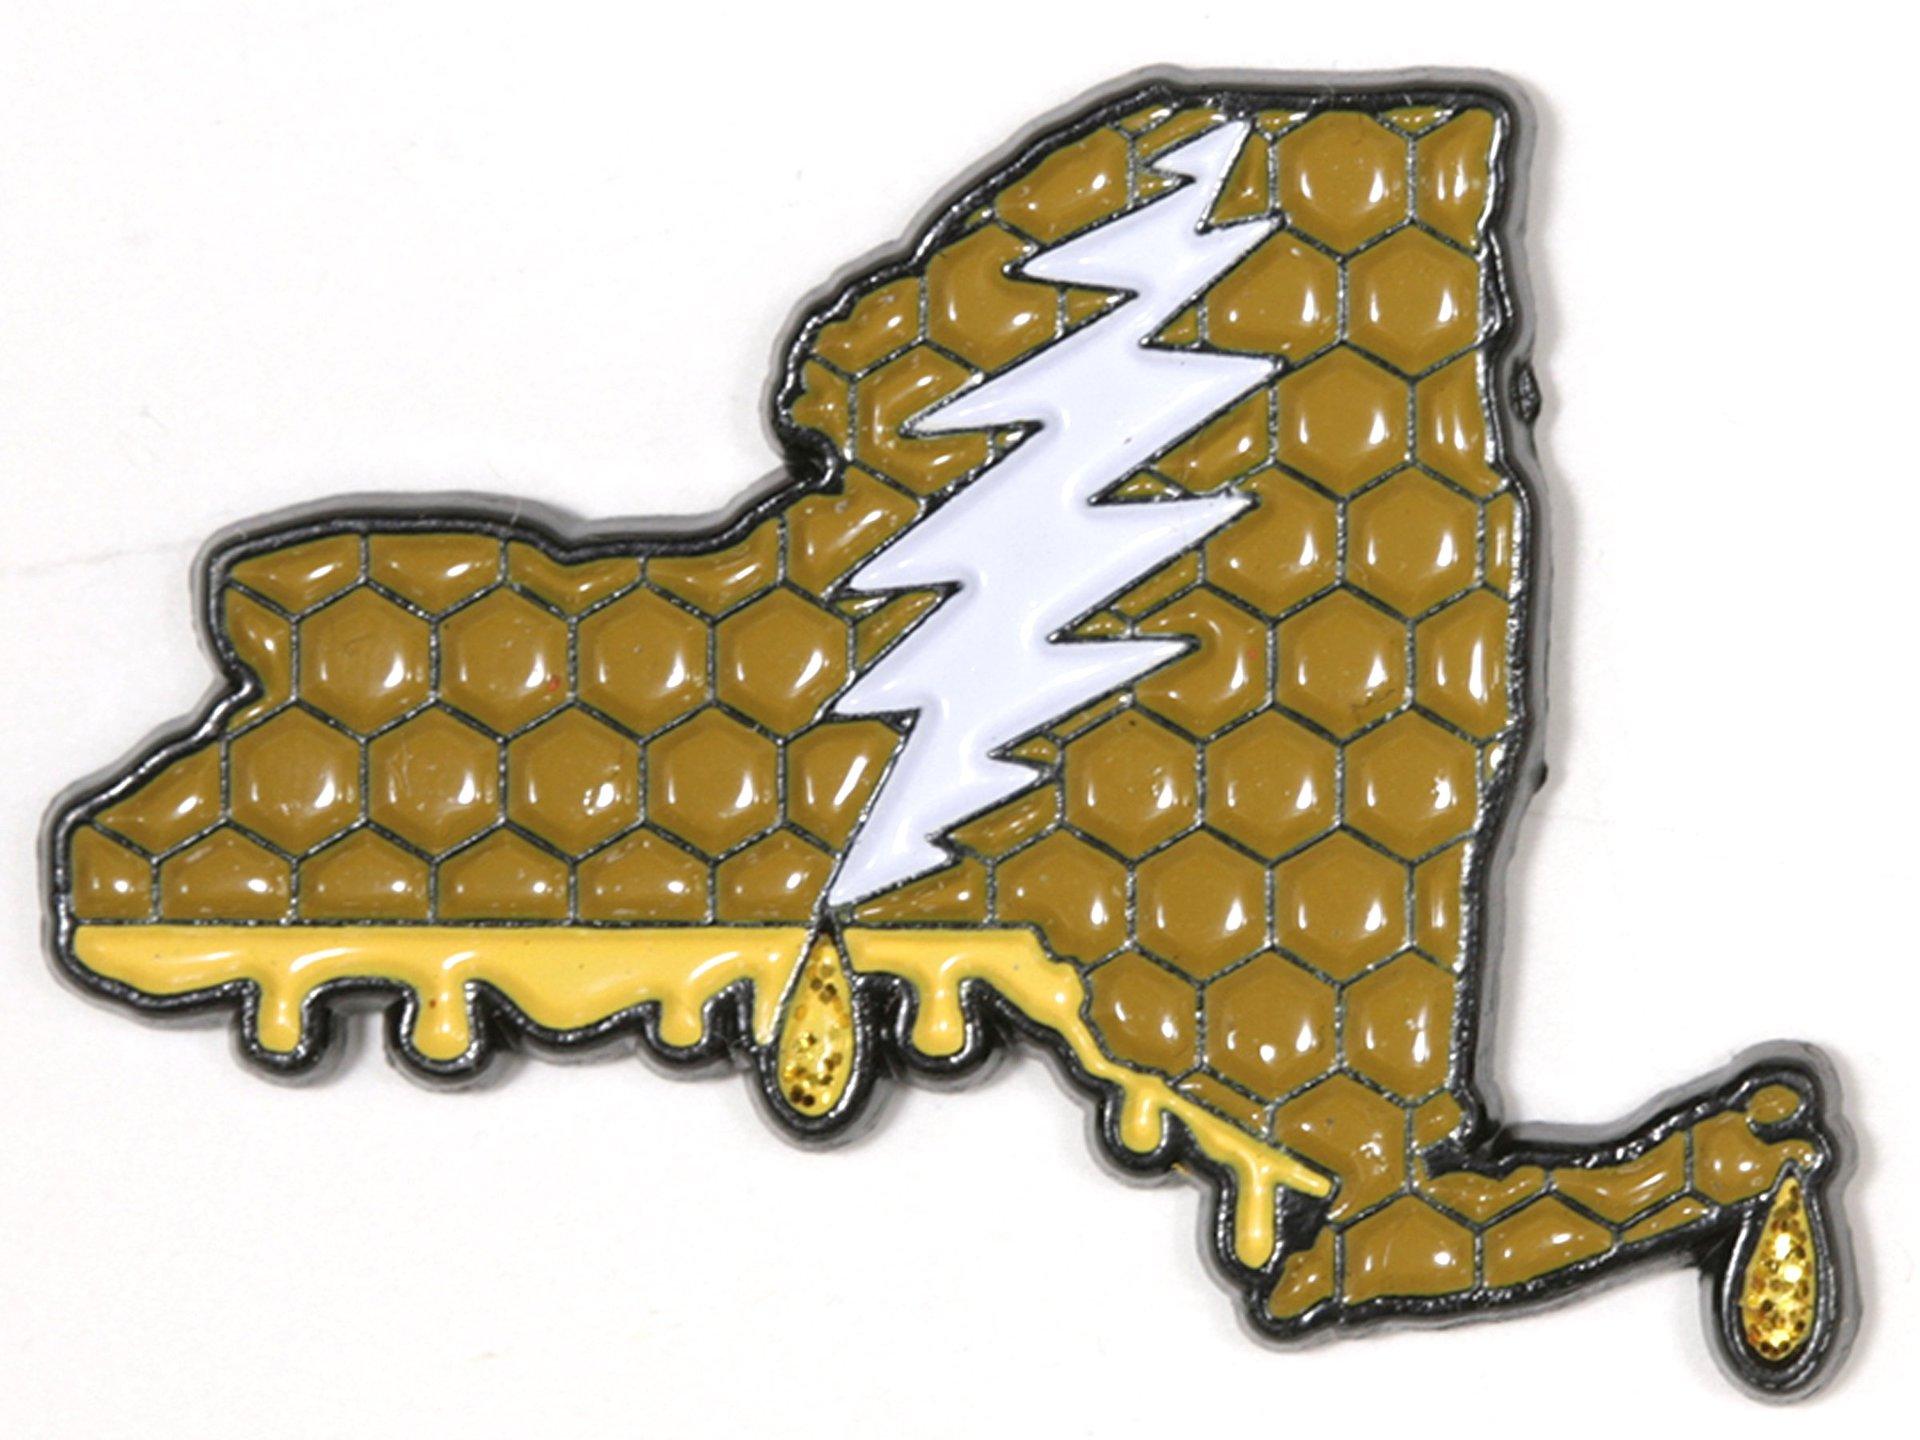 New York - It's a Dab State of Mind Deadhead Pin